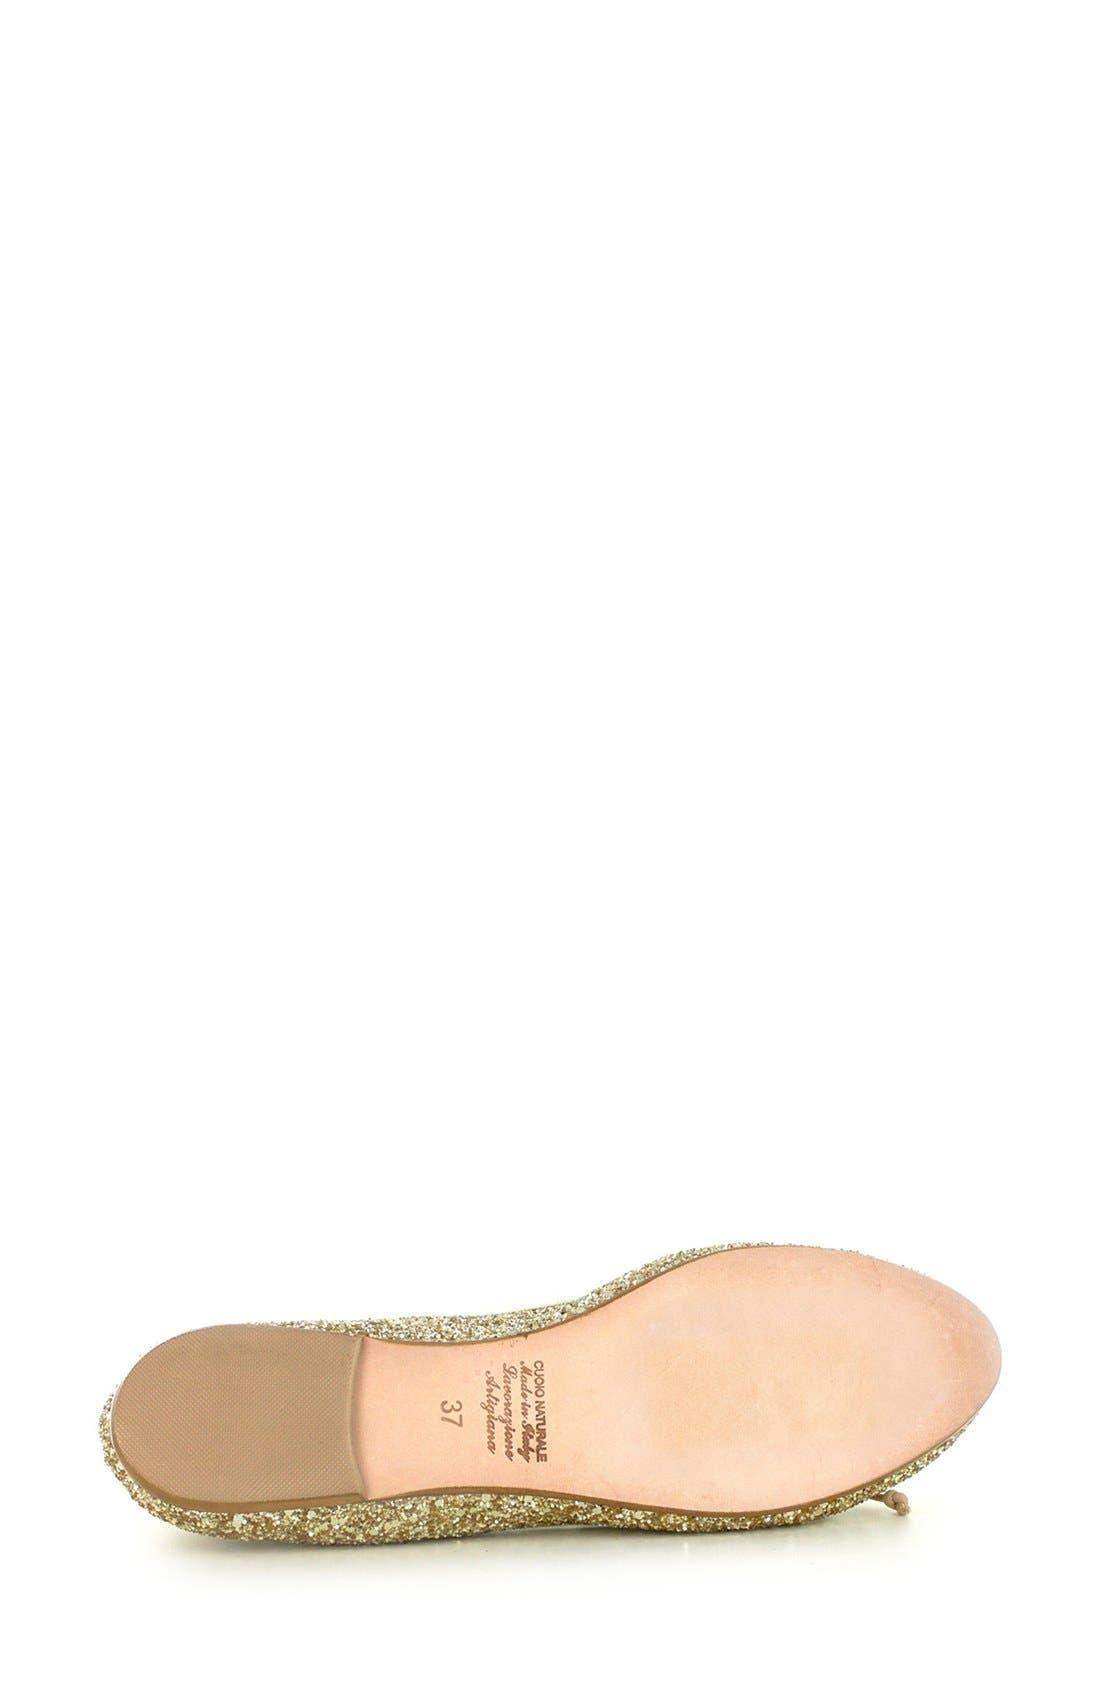 Summit 'Kendall' Ballet Flat,                             Alternate thumbnail 50, color,